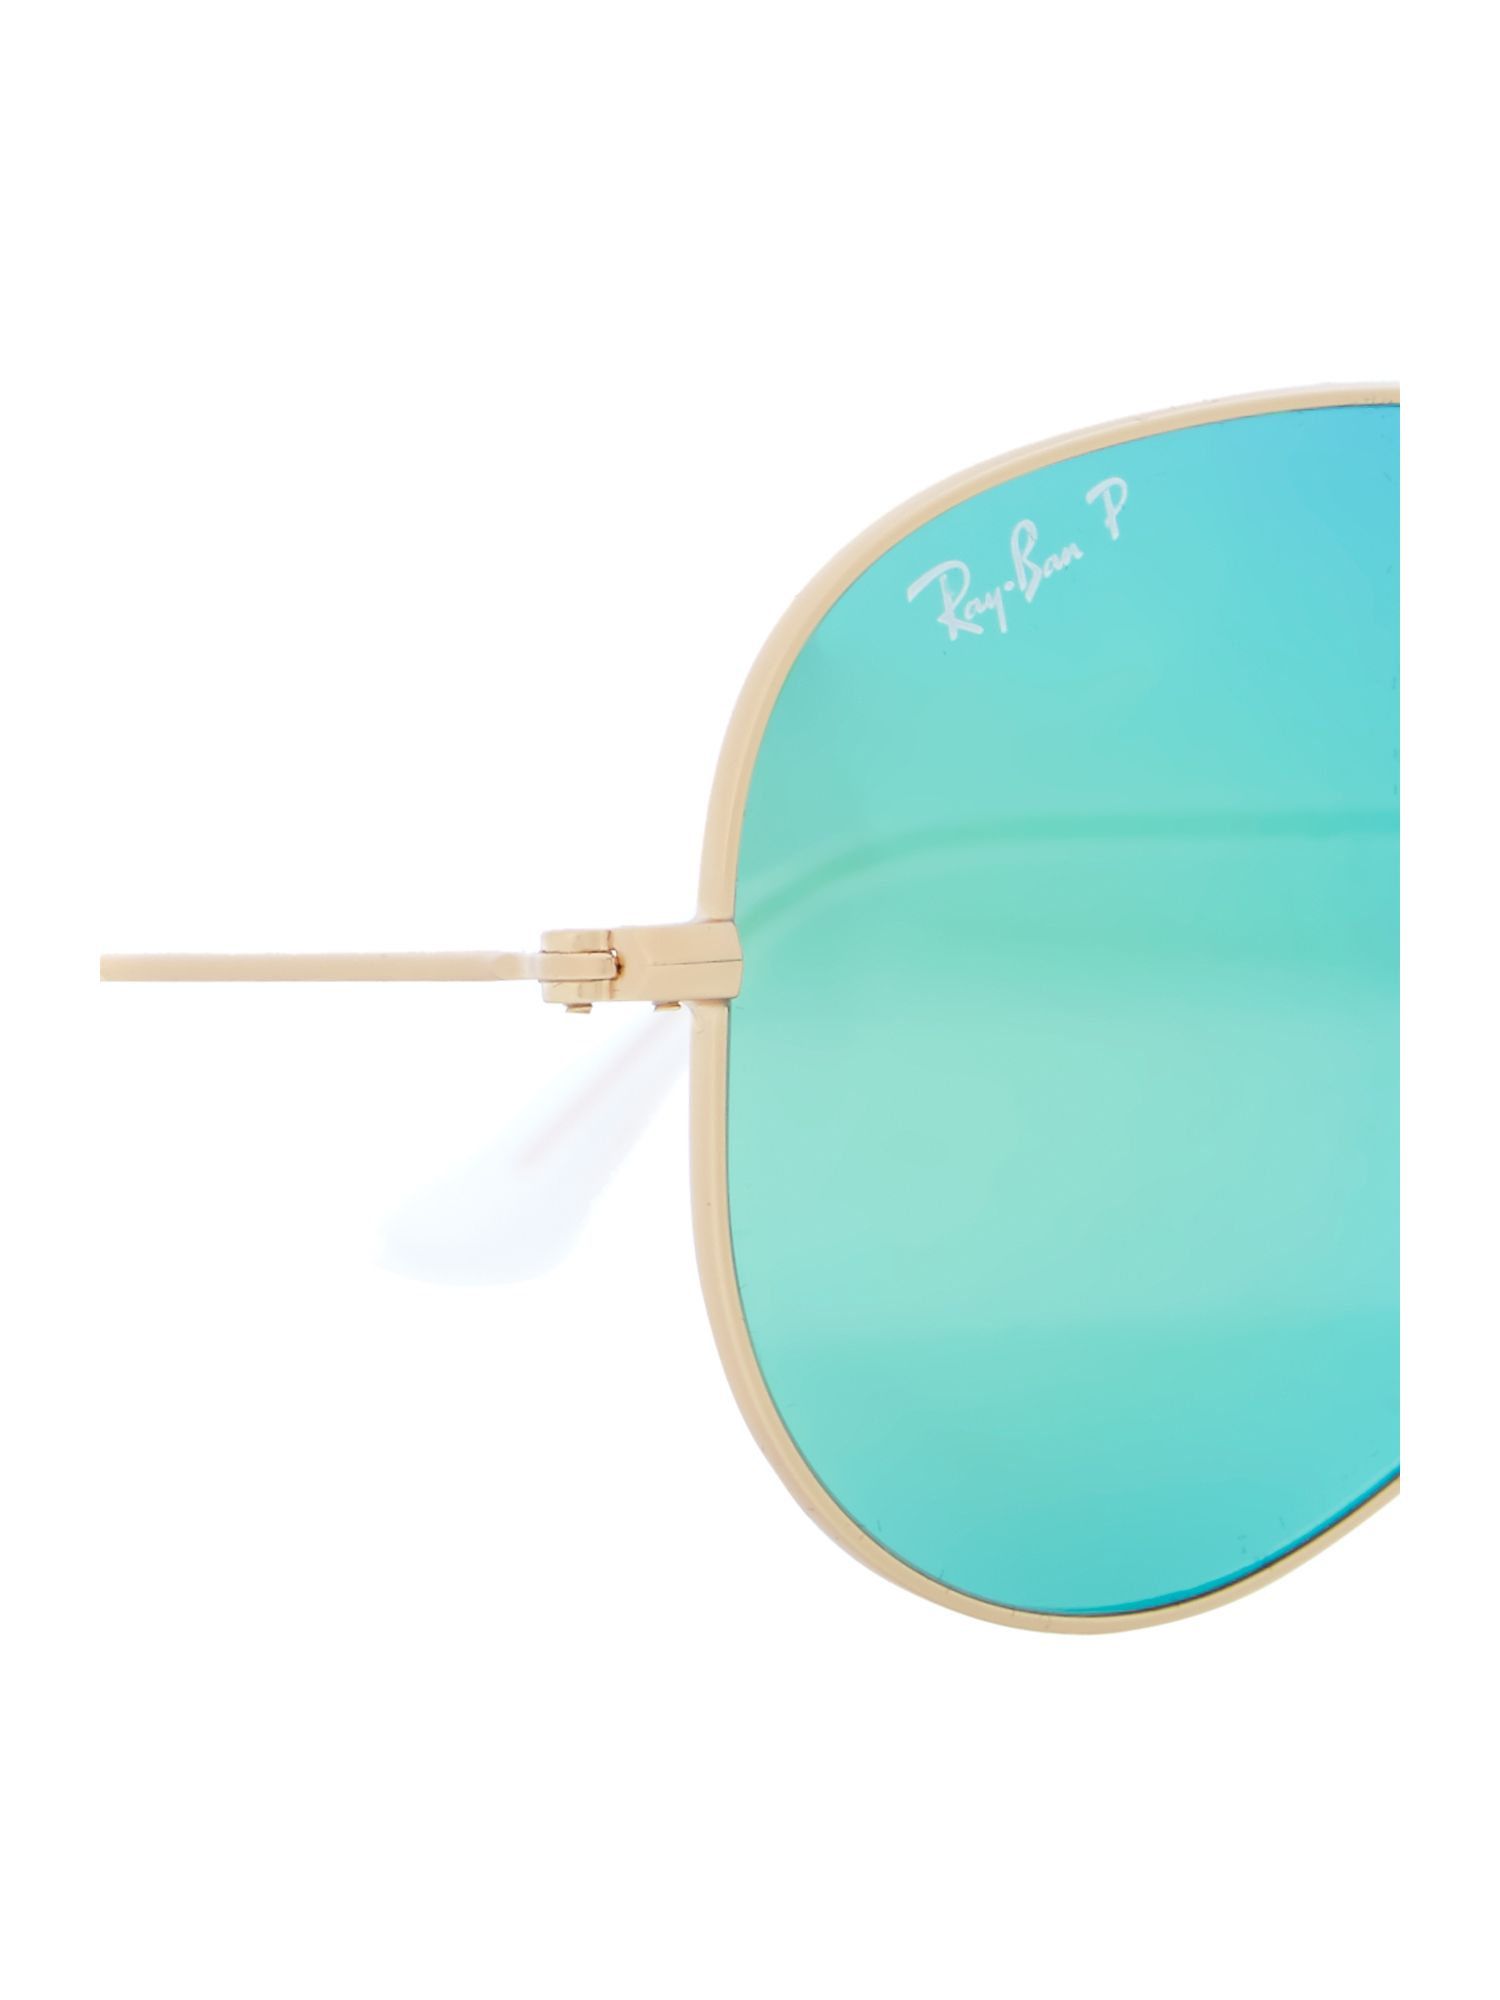 pilot ray ban 9nxf  ray-ban 0rb8313 pilot sunglasses